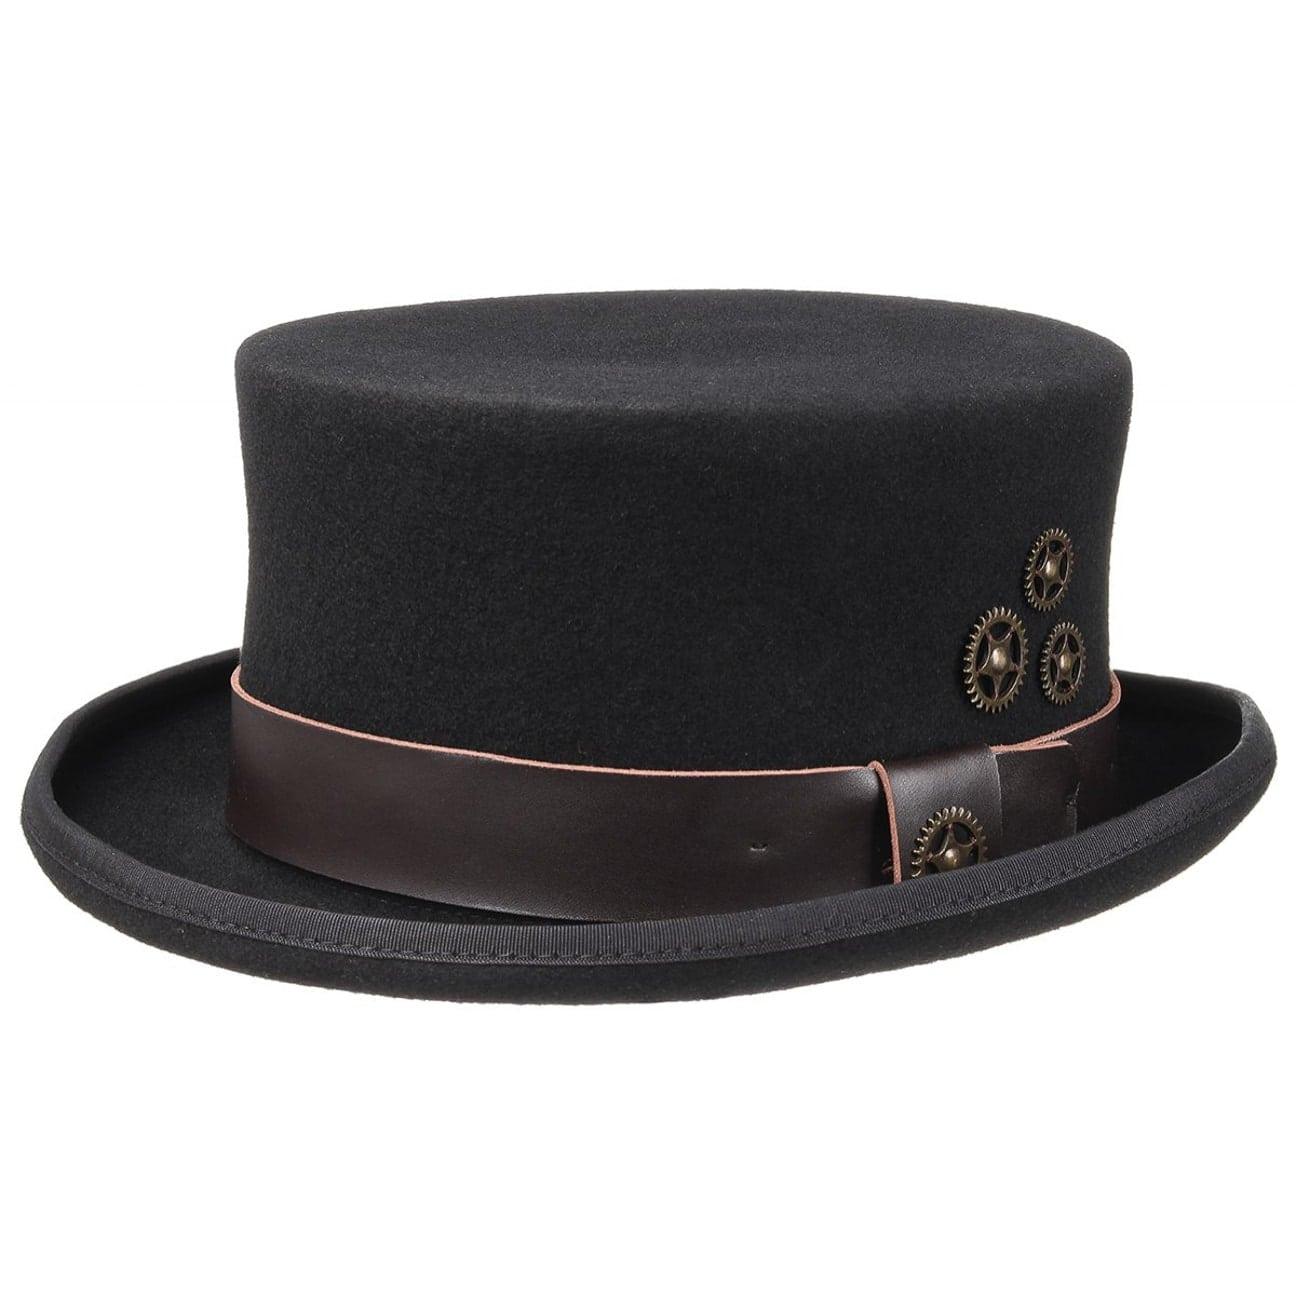 Sombrero de Copa Steampunk by Conner  sombrero steampunk